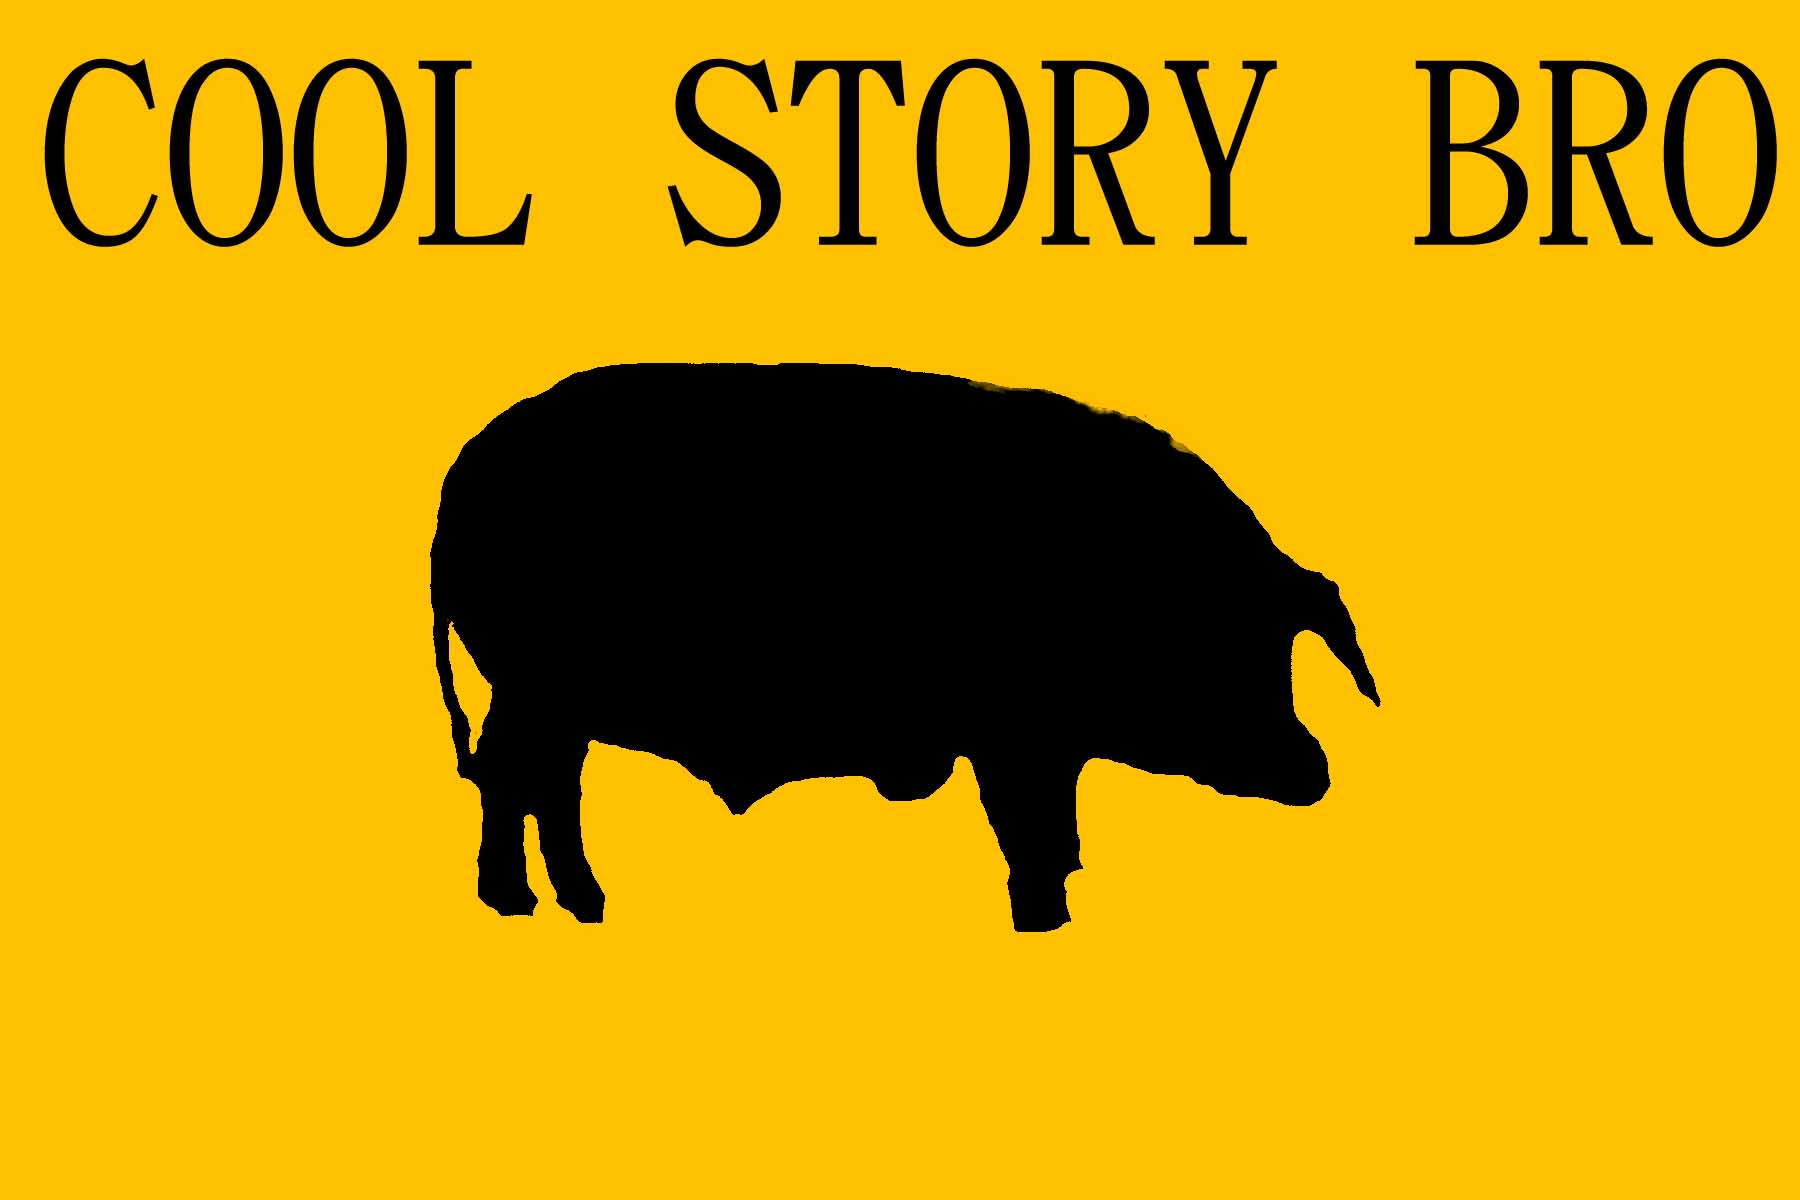 http://fc04.deviantart.net/fs42/f/2009/071/4/2/Cool_Story_Bro_by_CALLITACOMEB.jpg